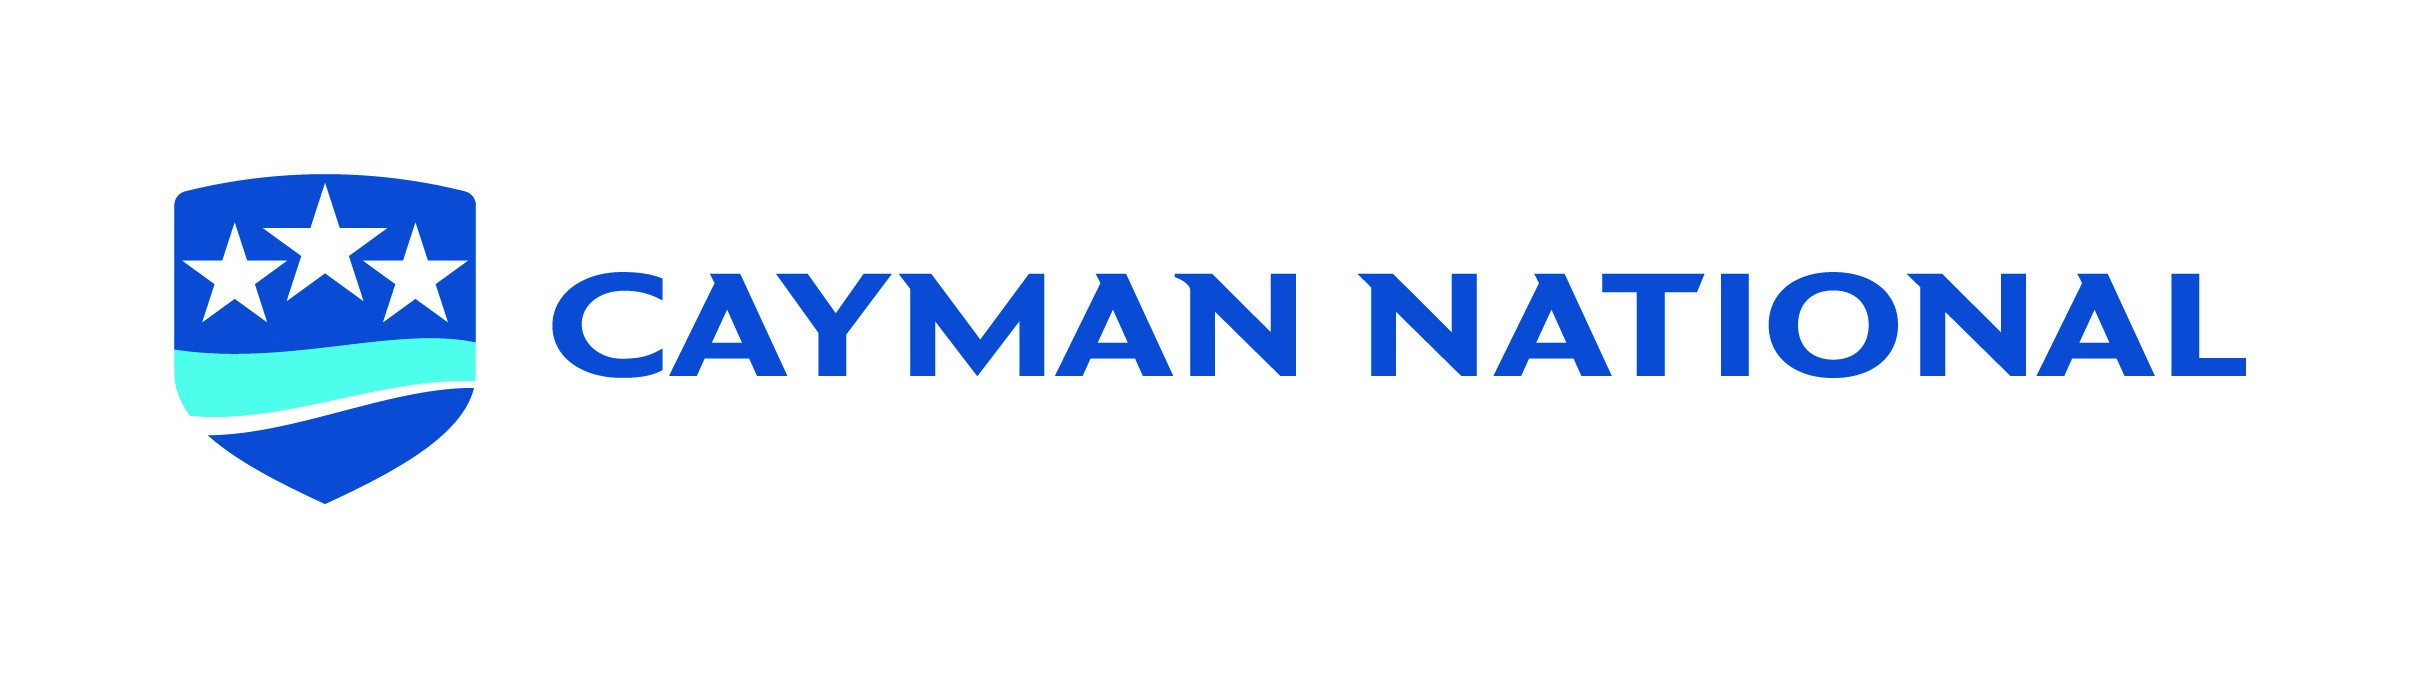 https://www.caymannational.com/index.html